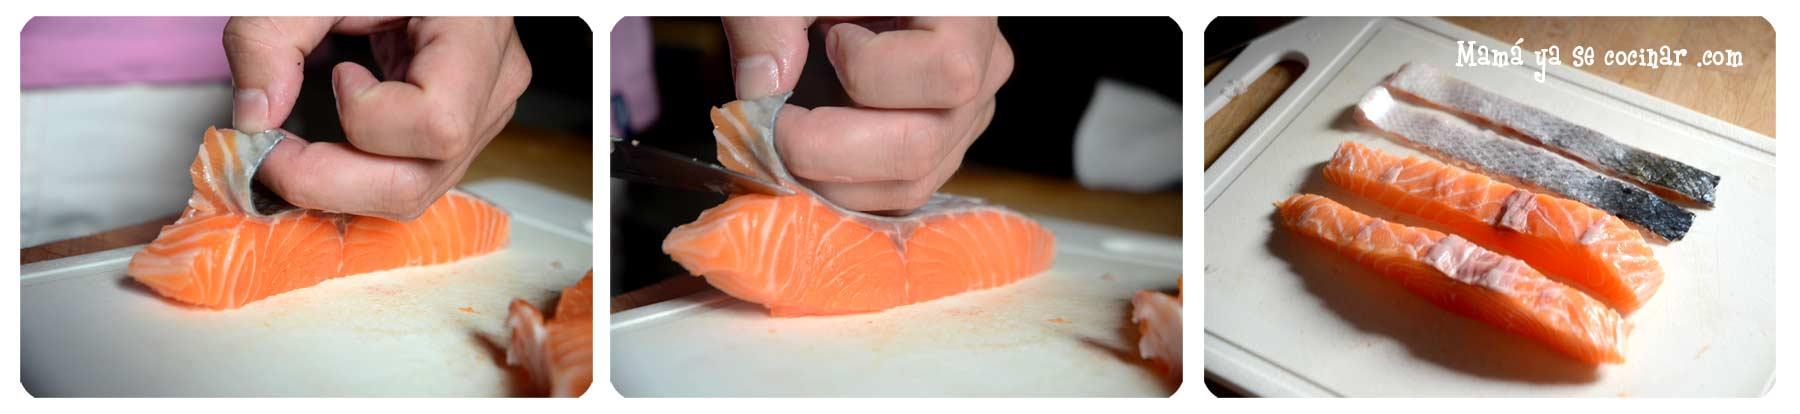 hacer sashimi de salmon